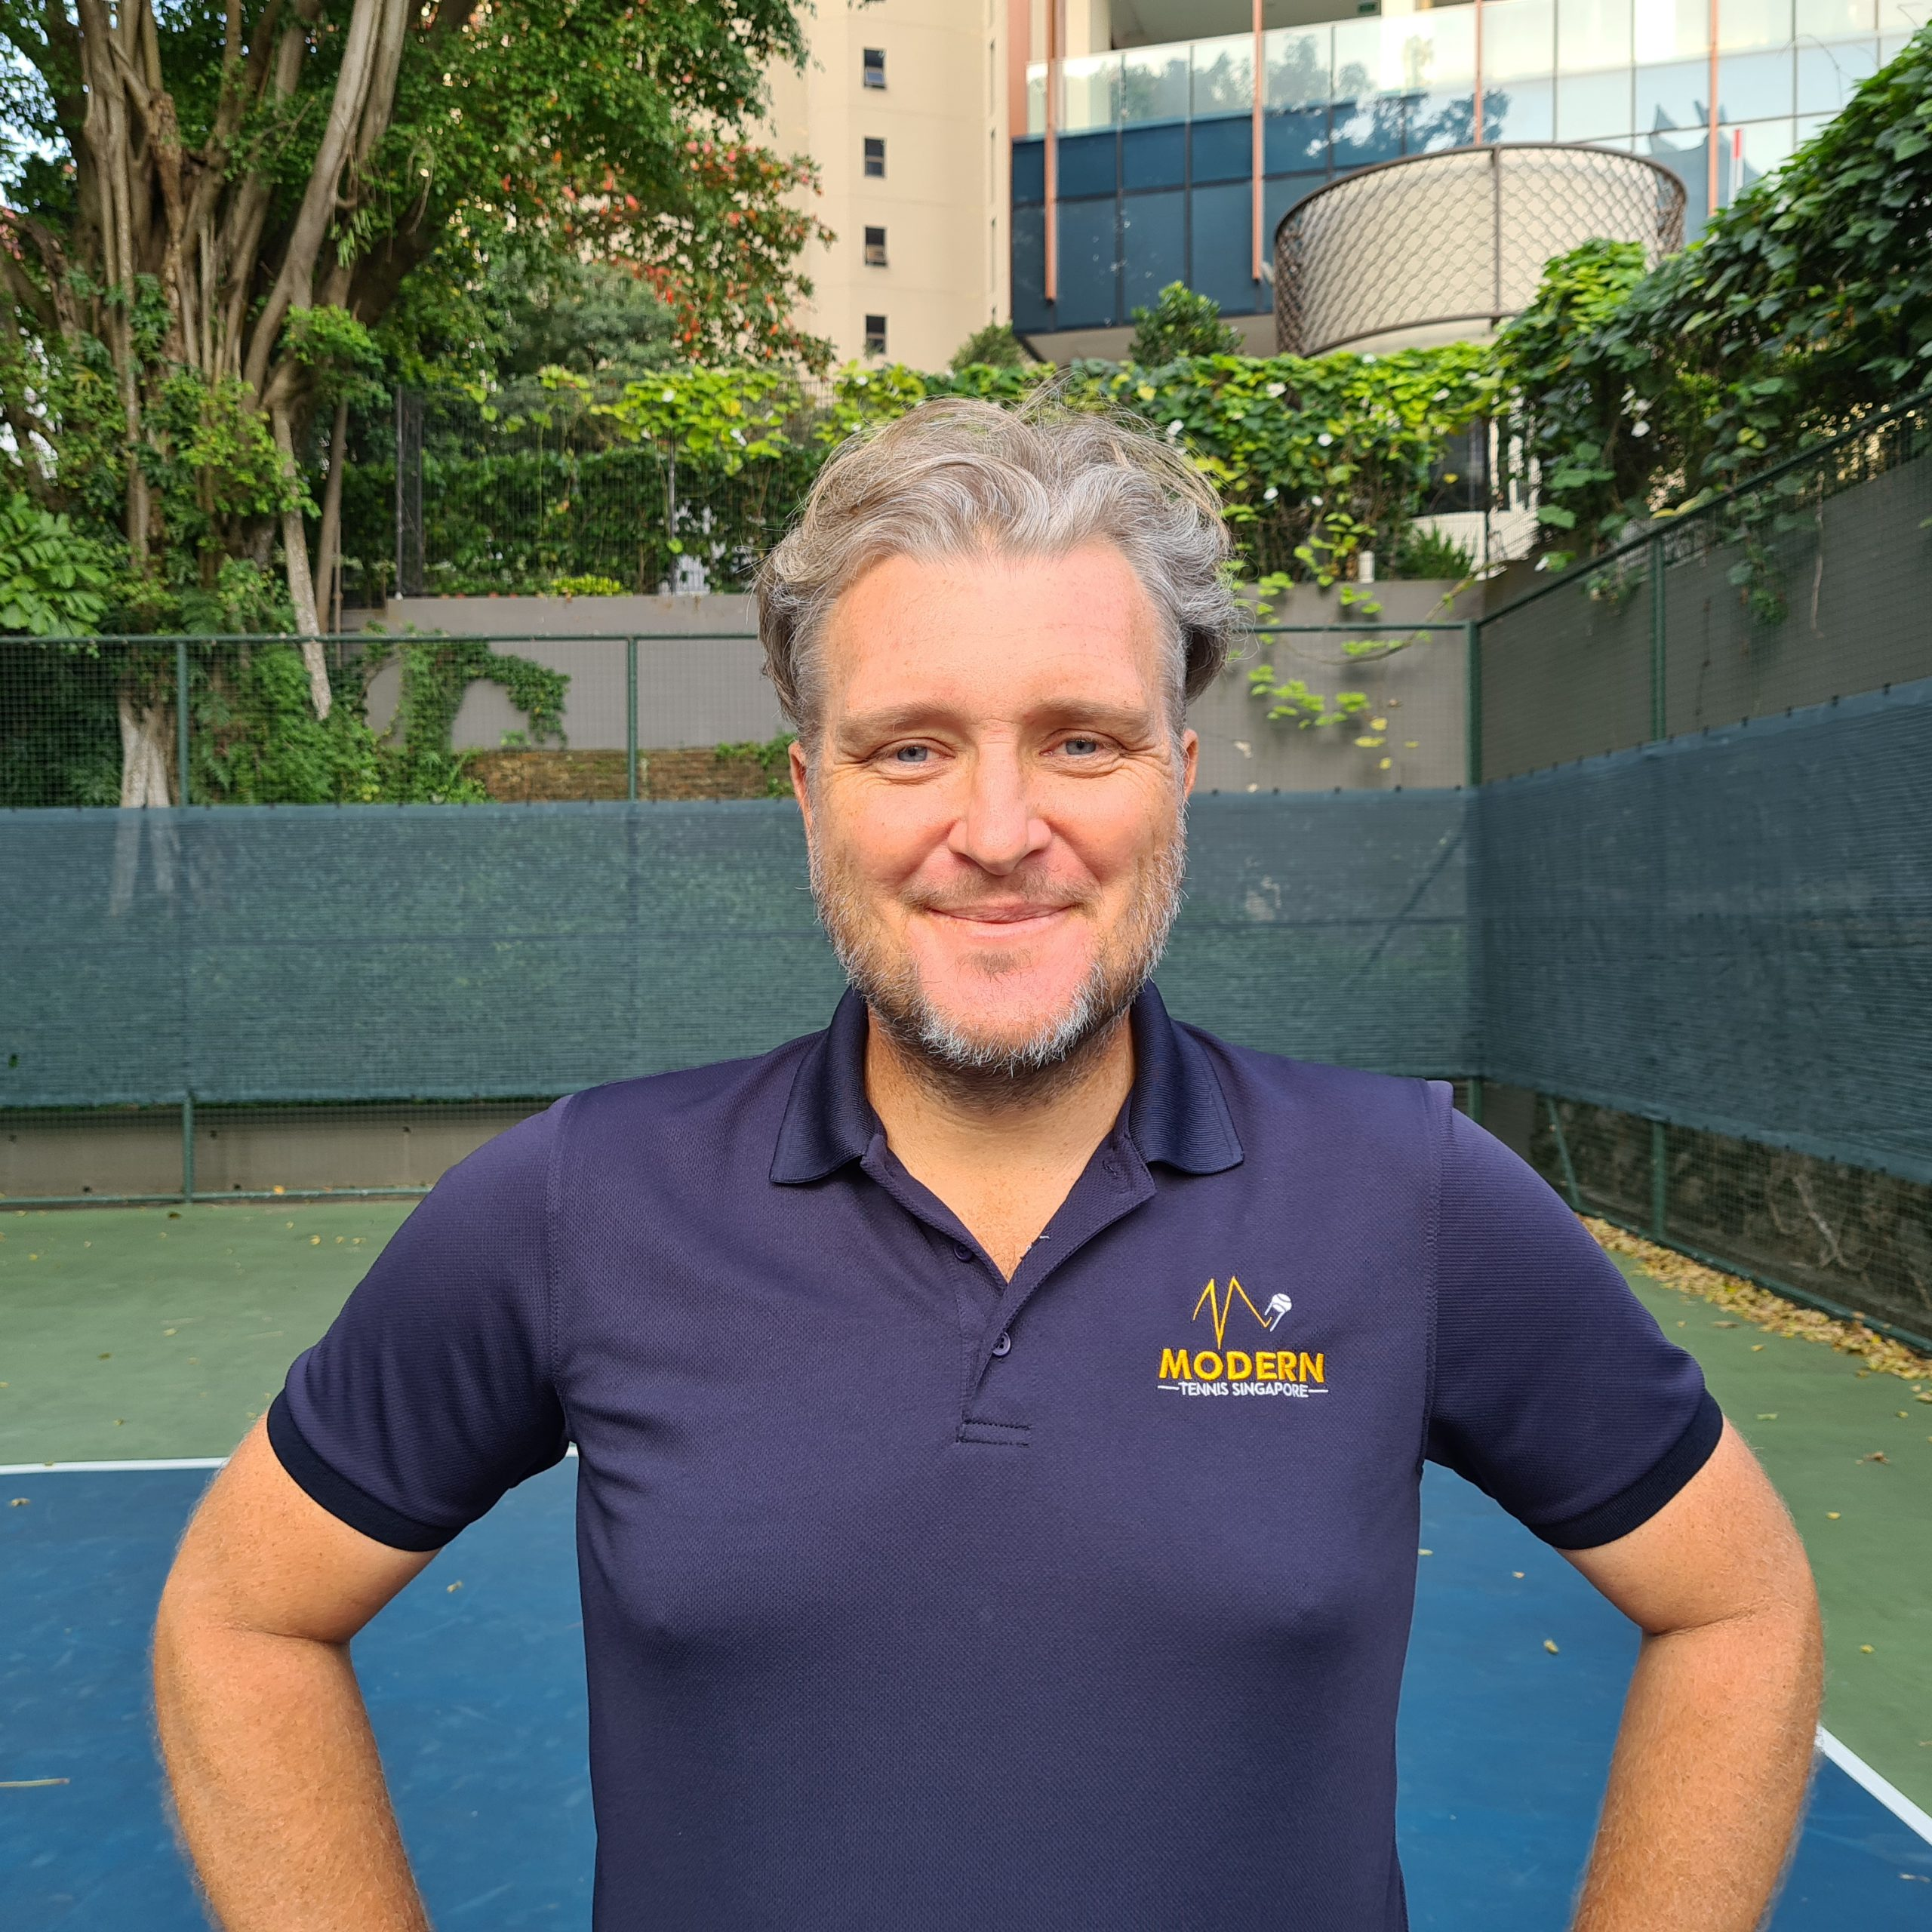 Coach David - Modern Tennis Singapore